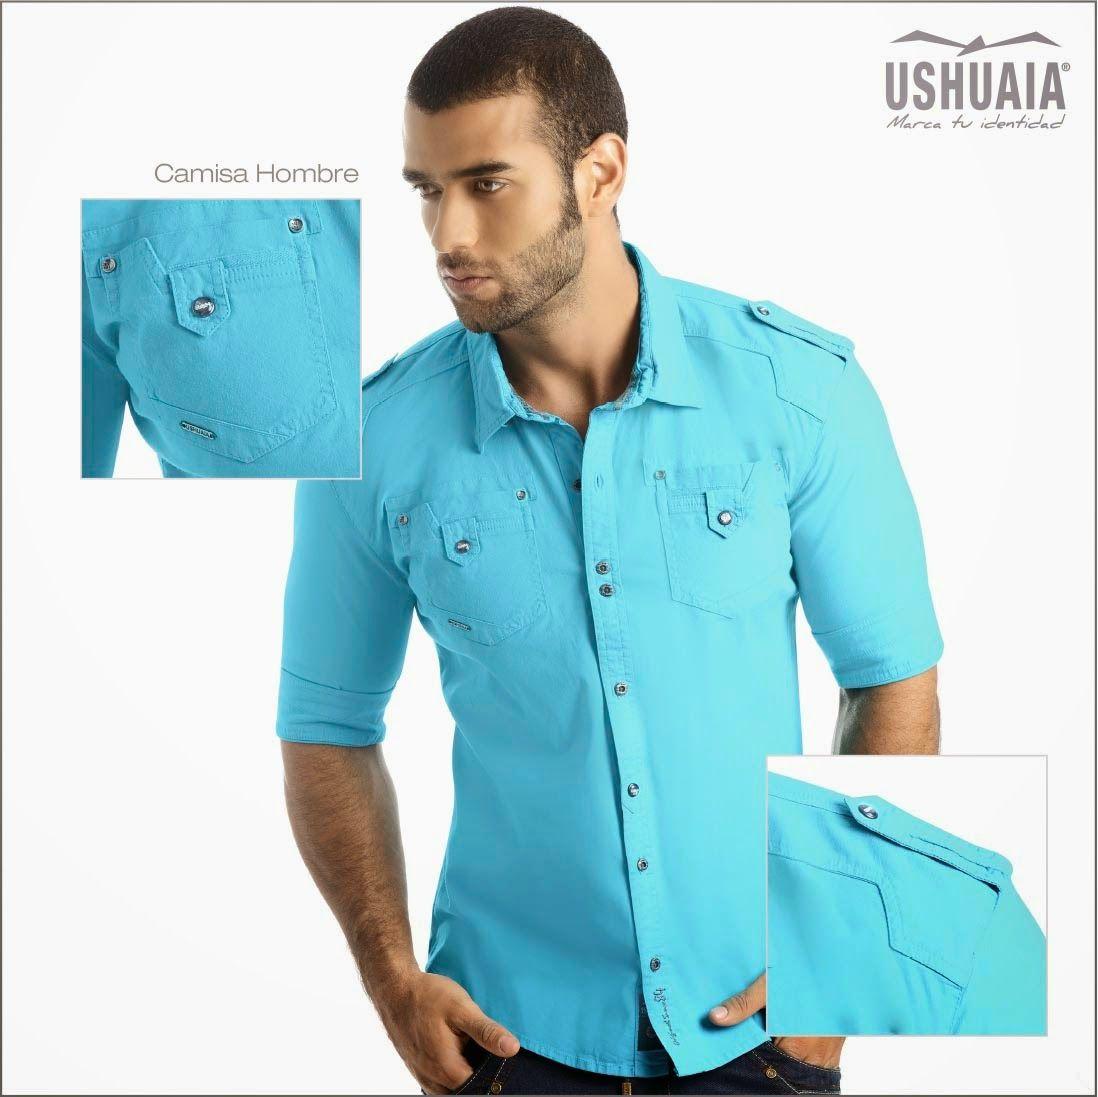 38f3aa467b Resultado de imagen para camisa manga tres cuartos para hombre ...